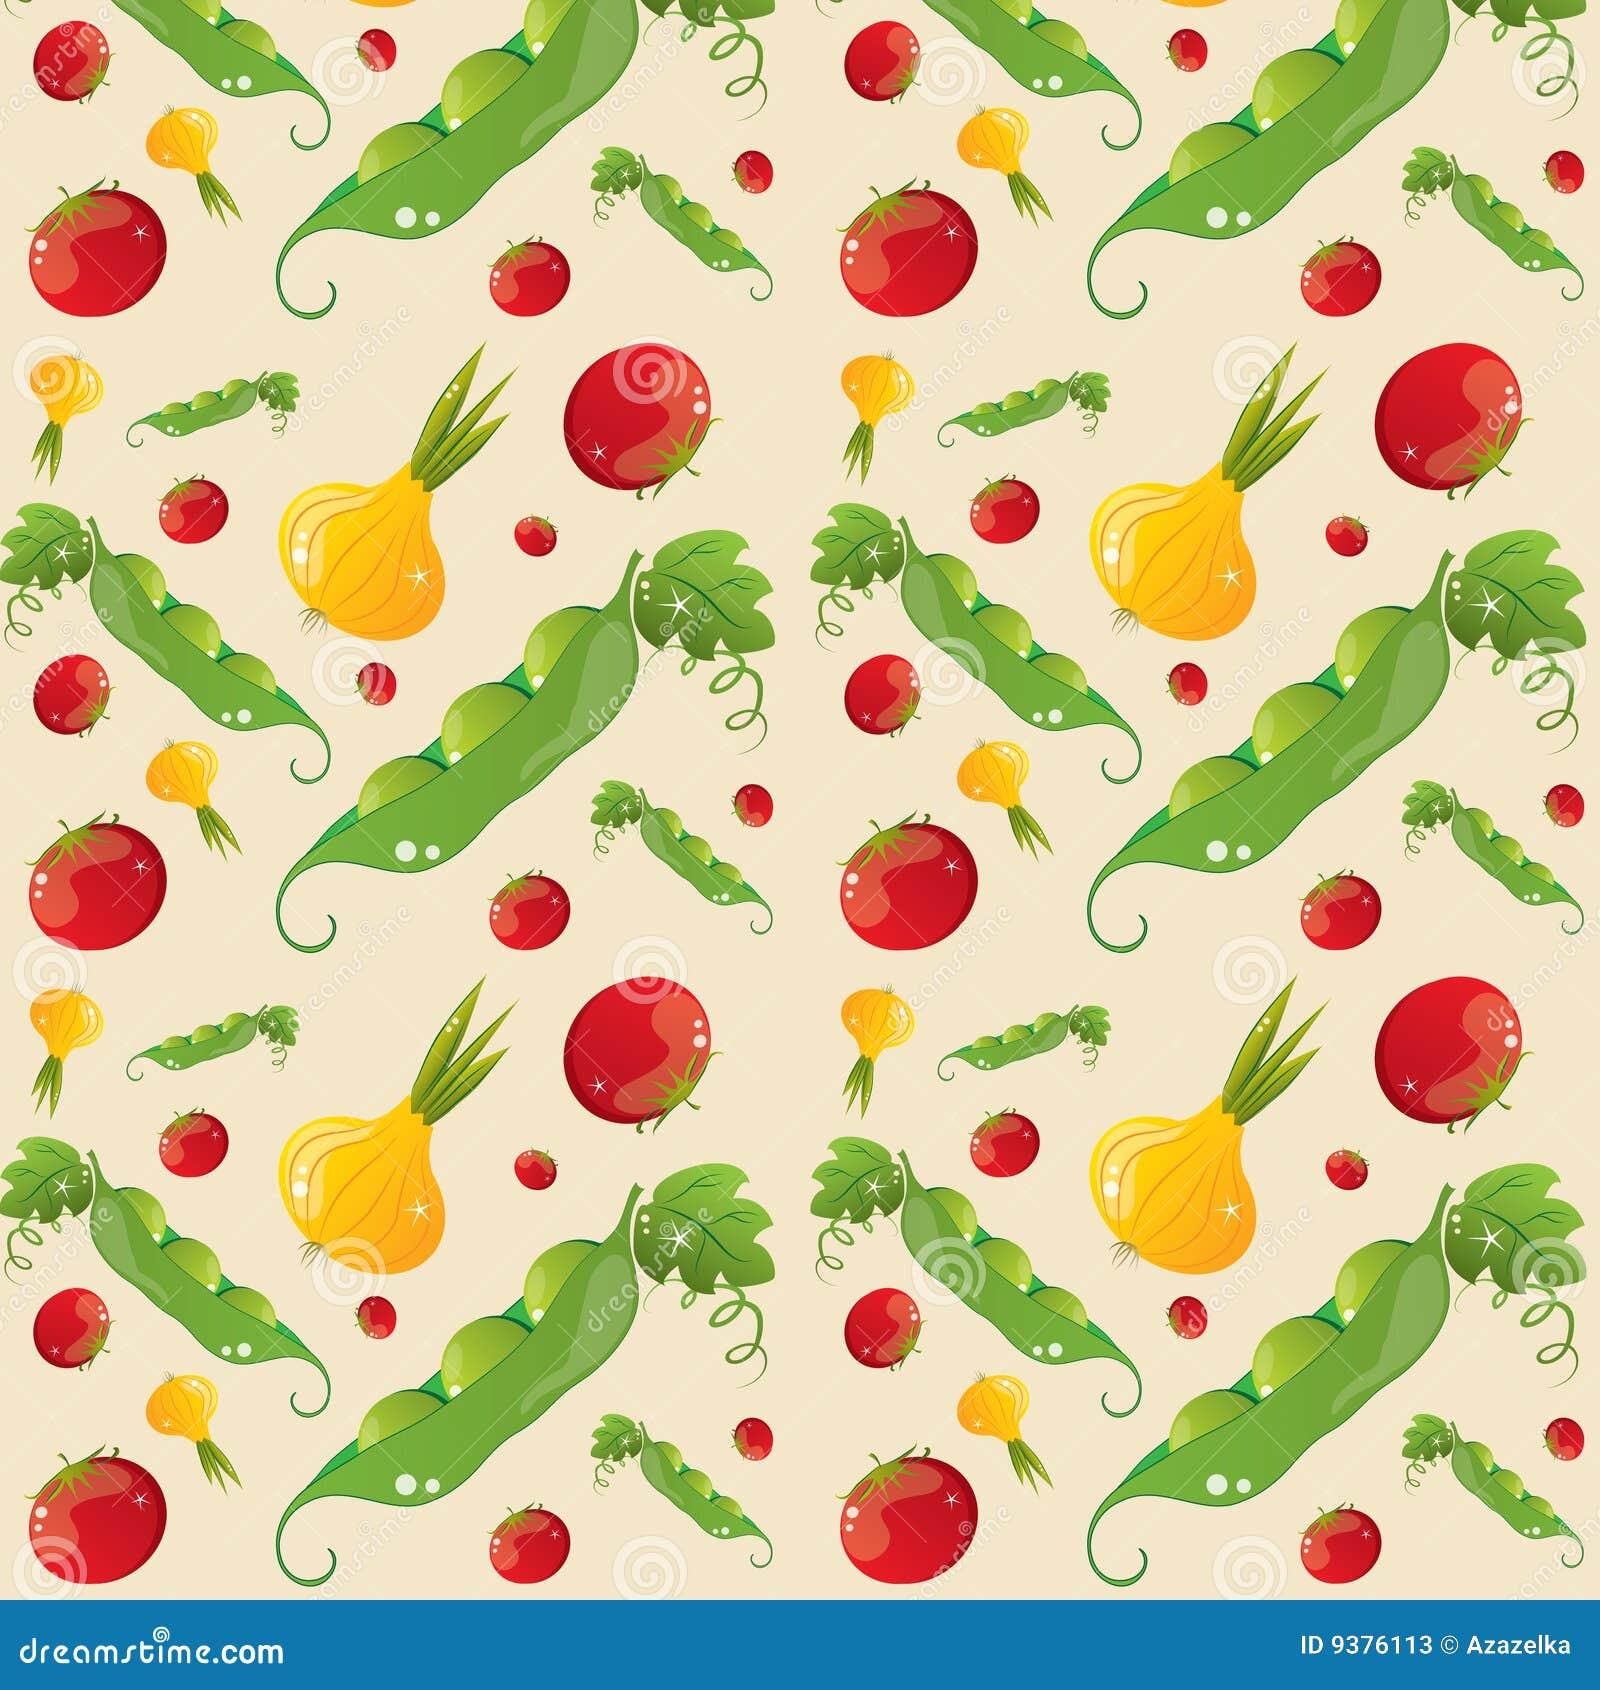 Vegetables texture